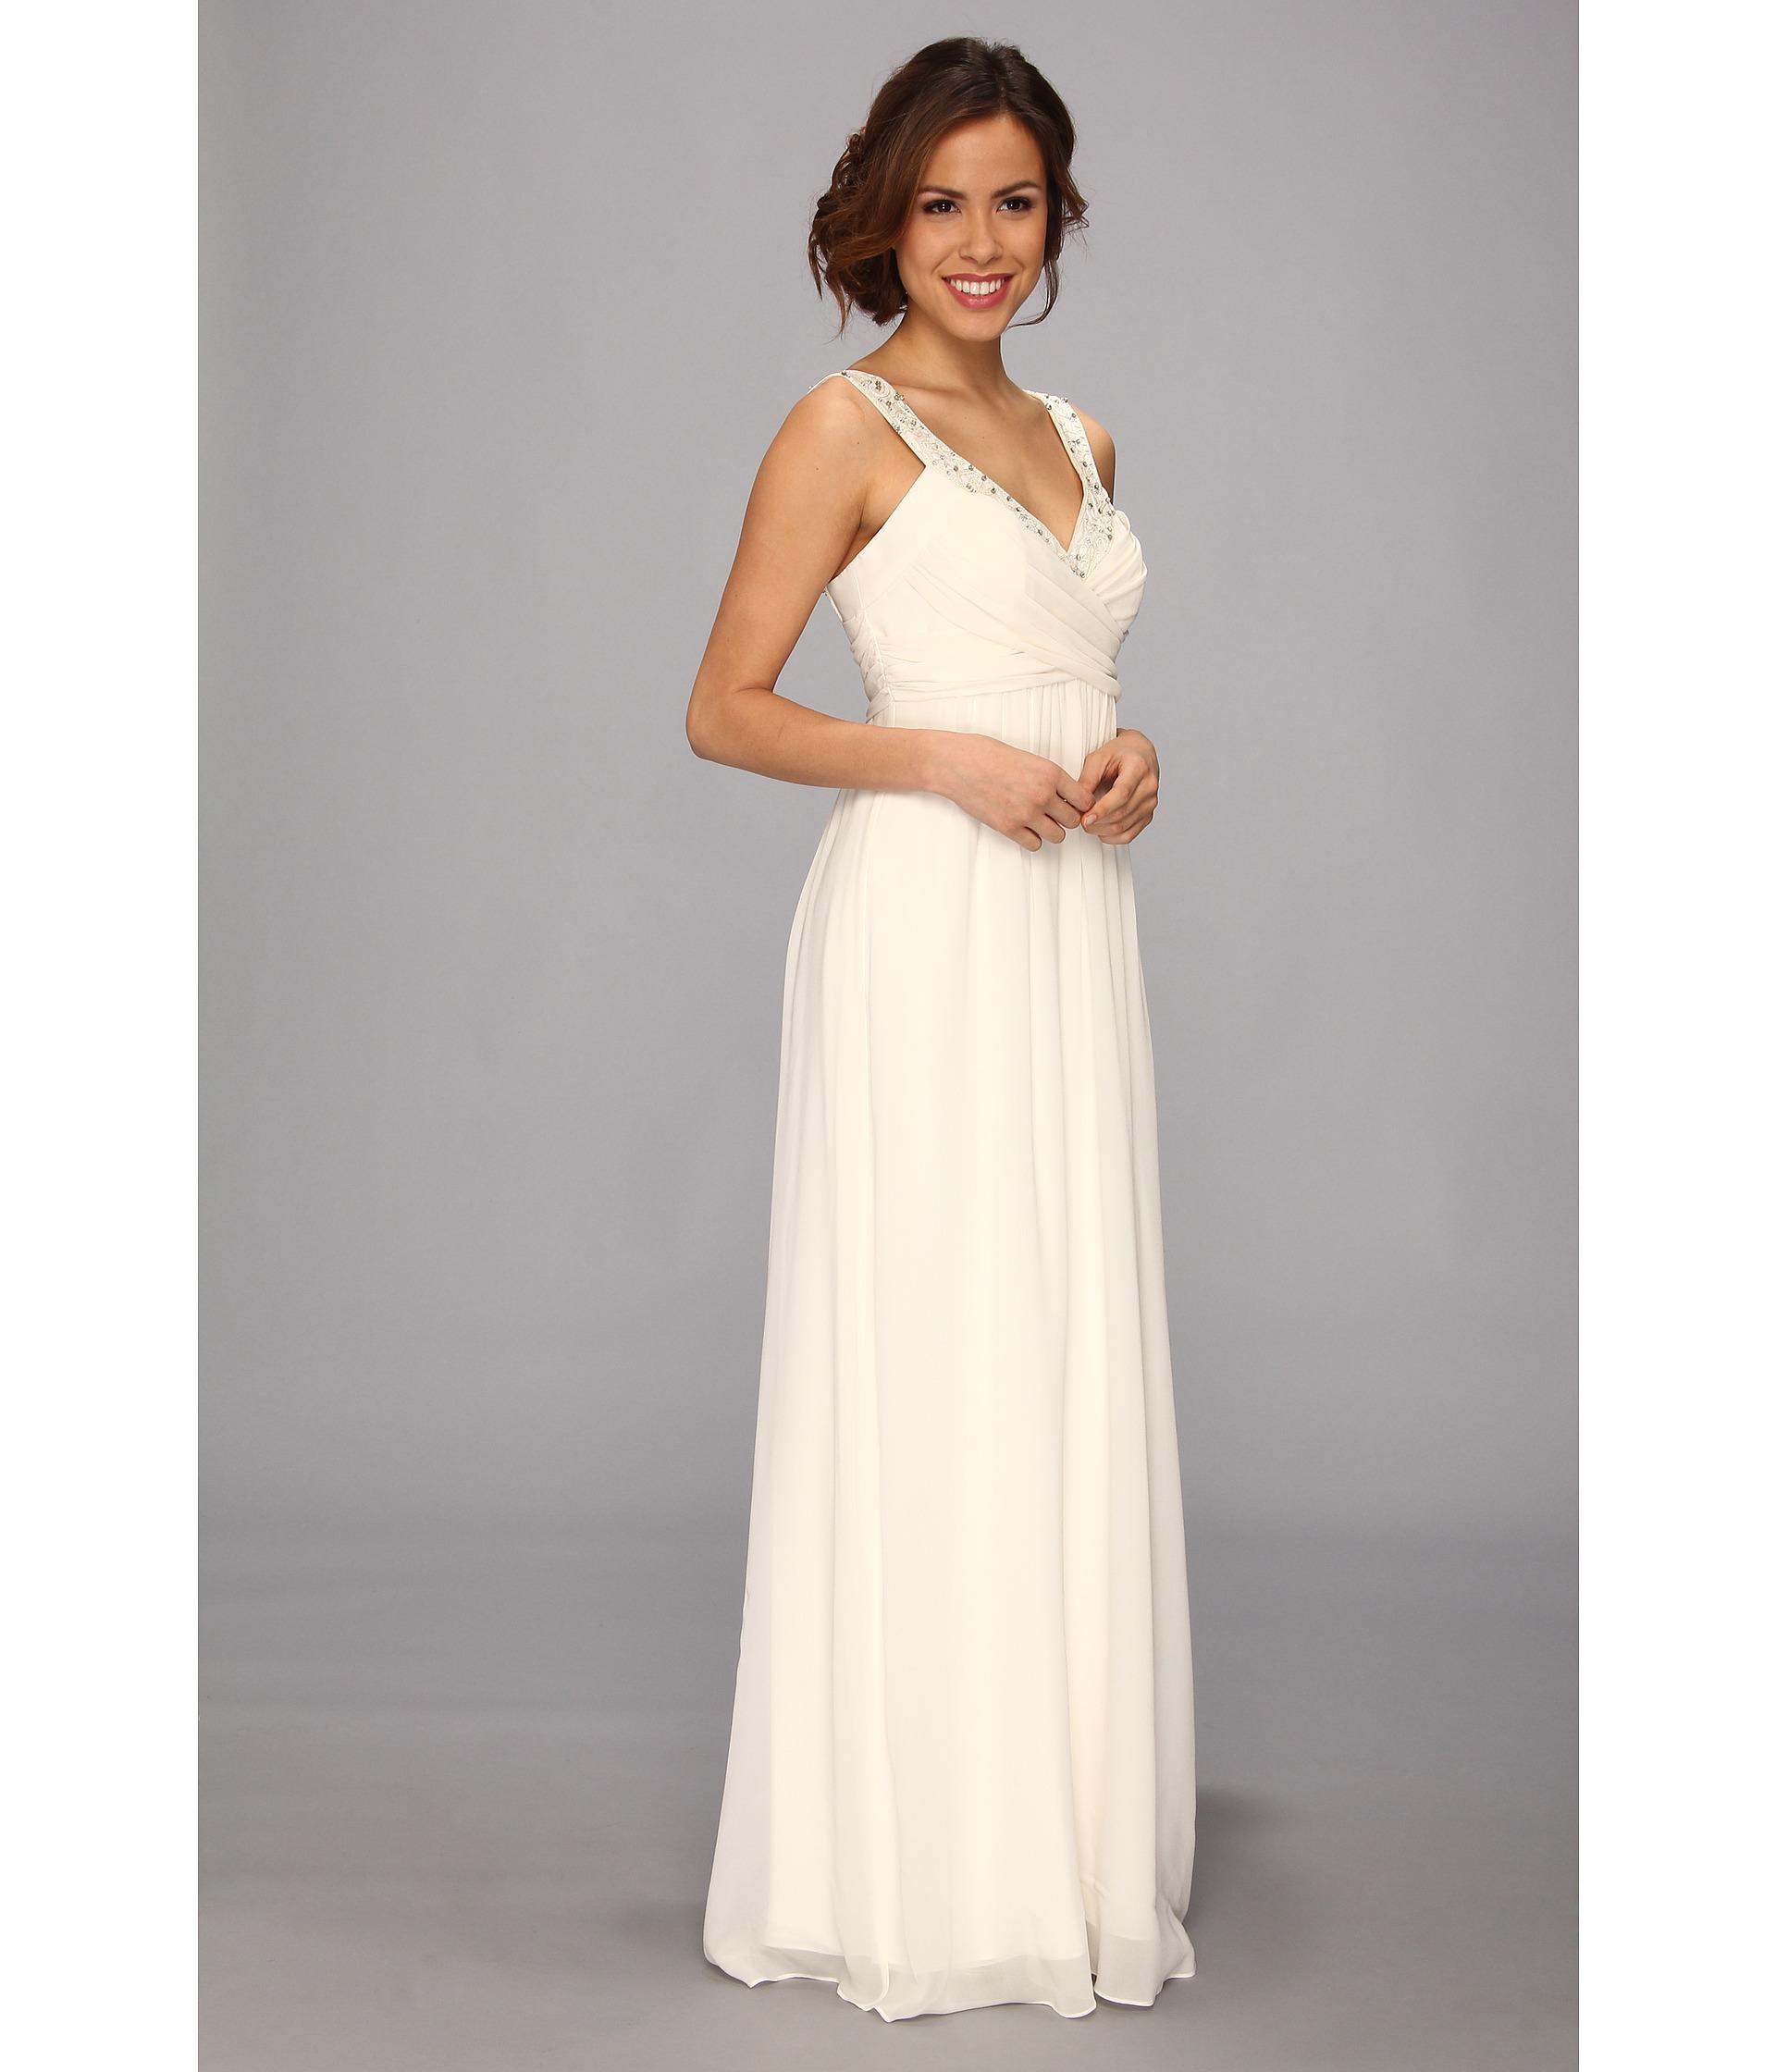 Nicole miller double face satin silk georgette bridal gown for Silk georgette wedding dress